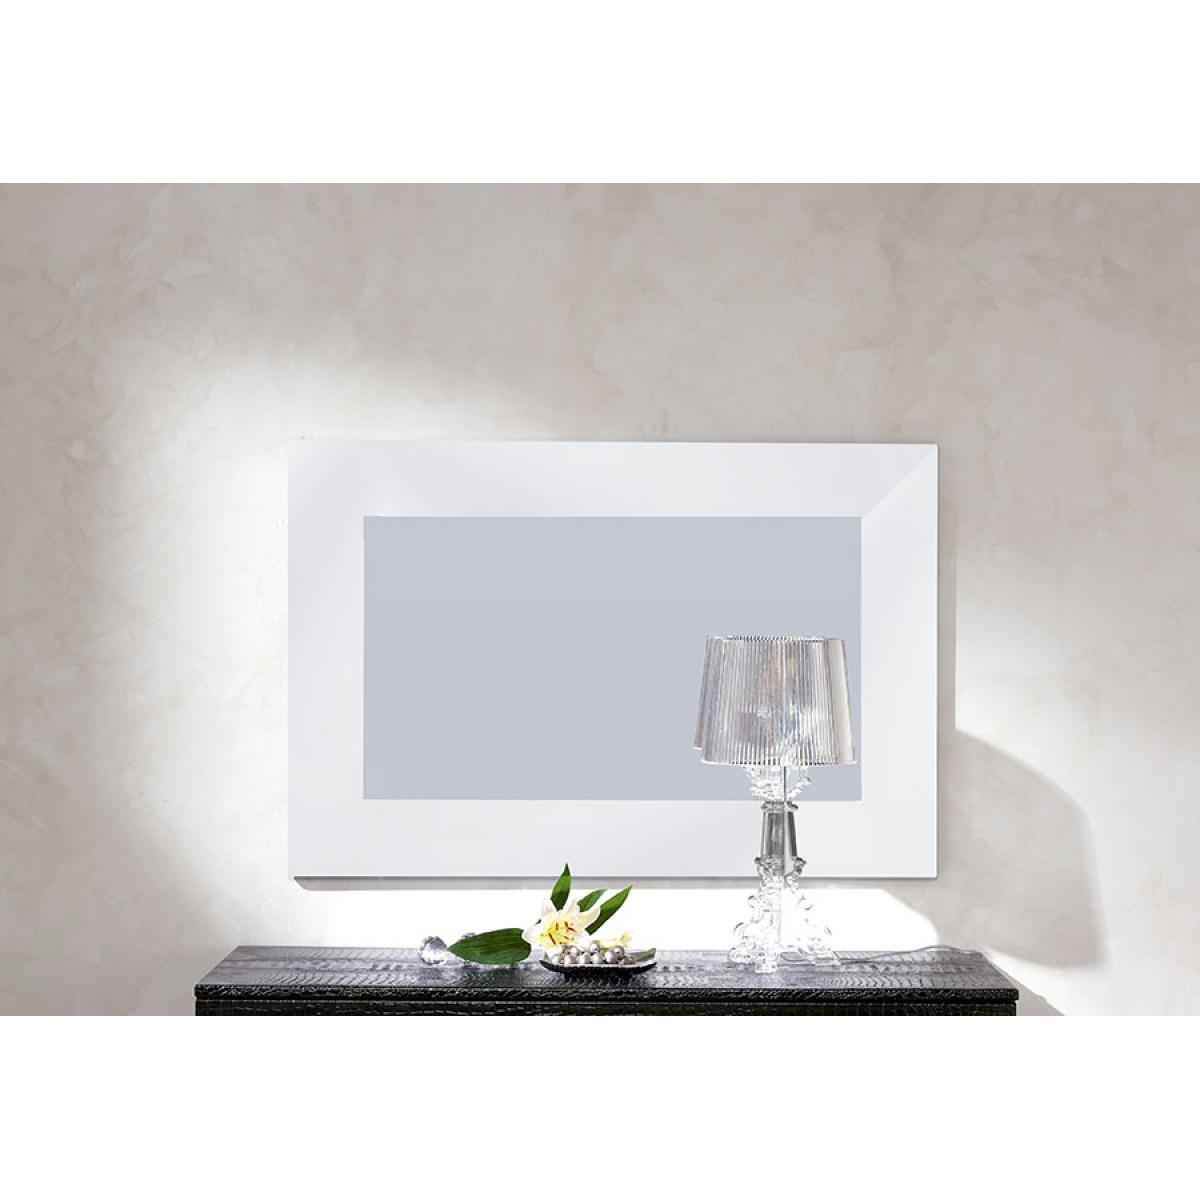 Sofamobili Miroir mural blanc noir ou gris laqué design RAMSAY